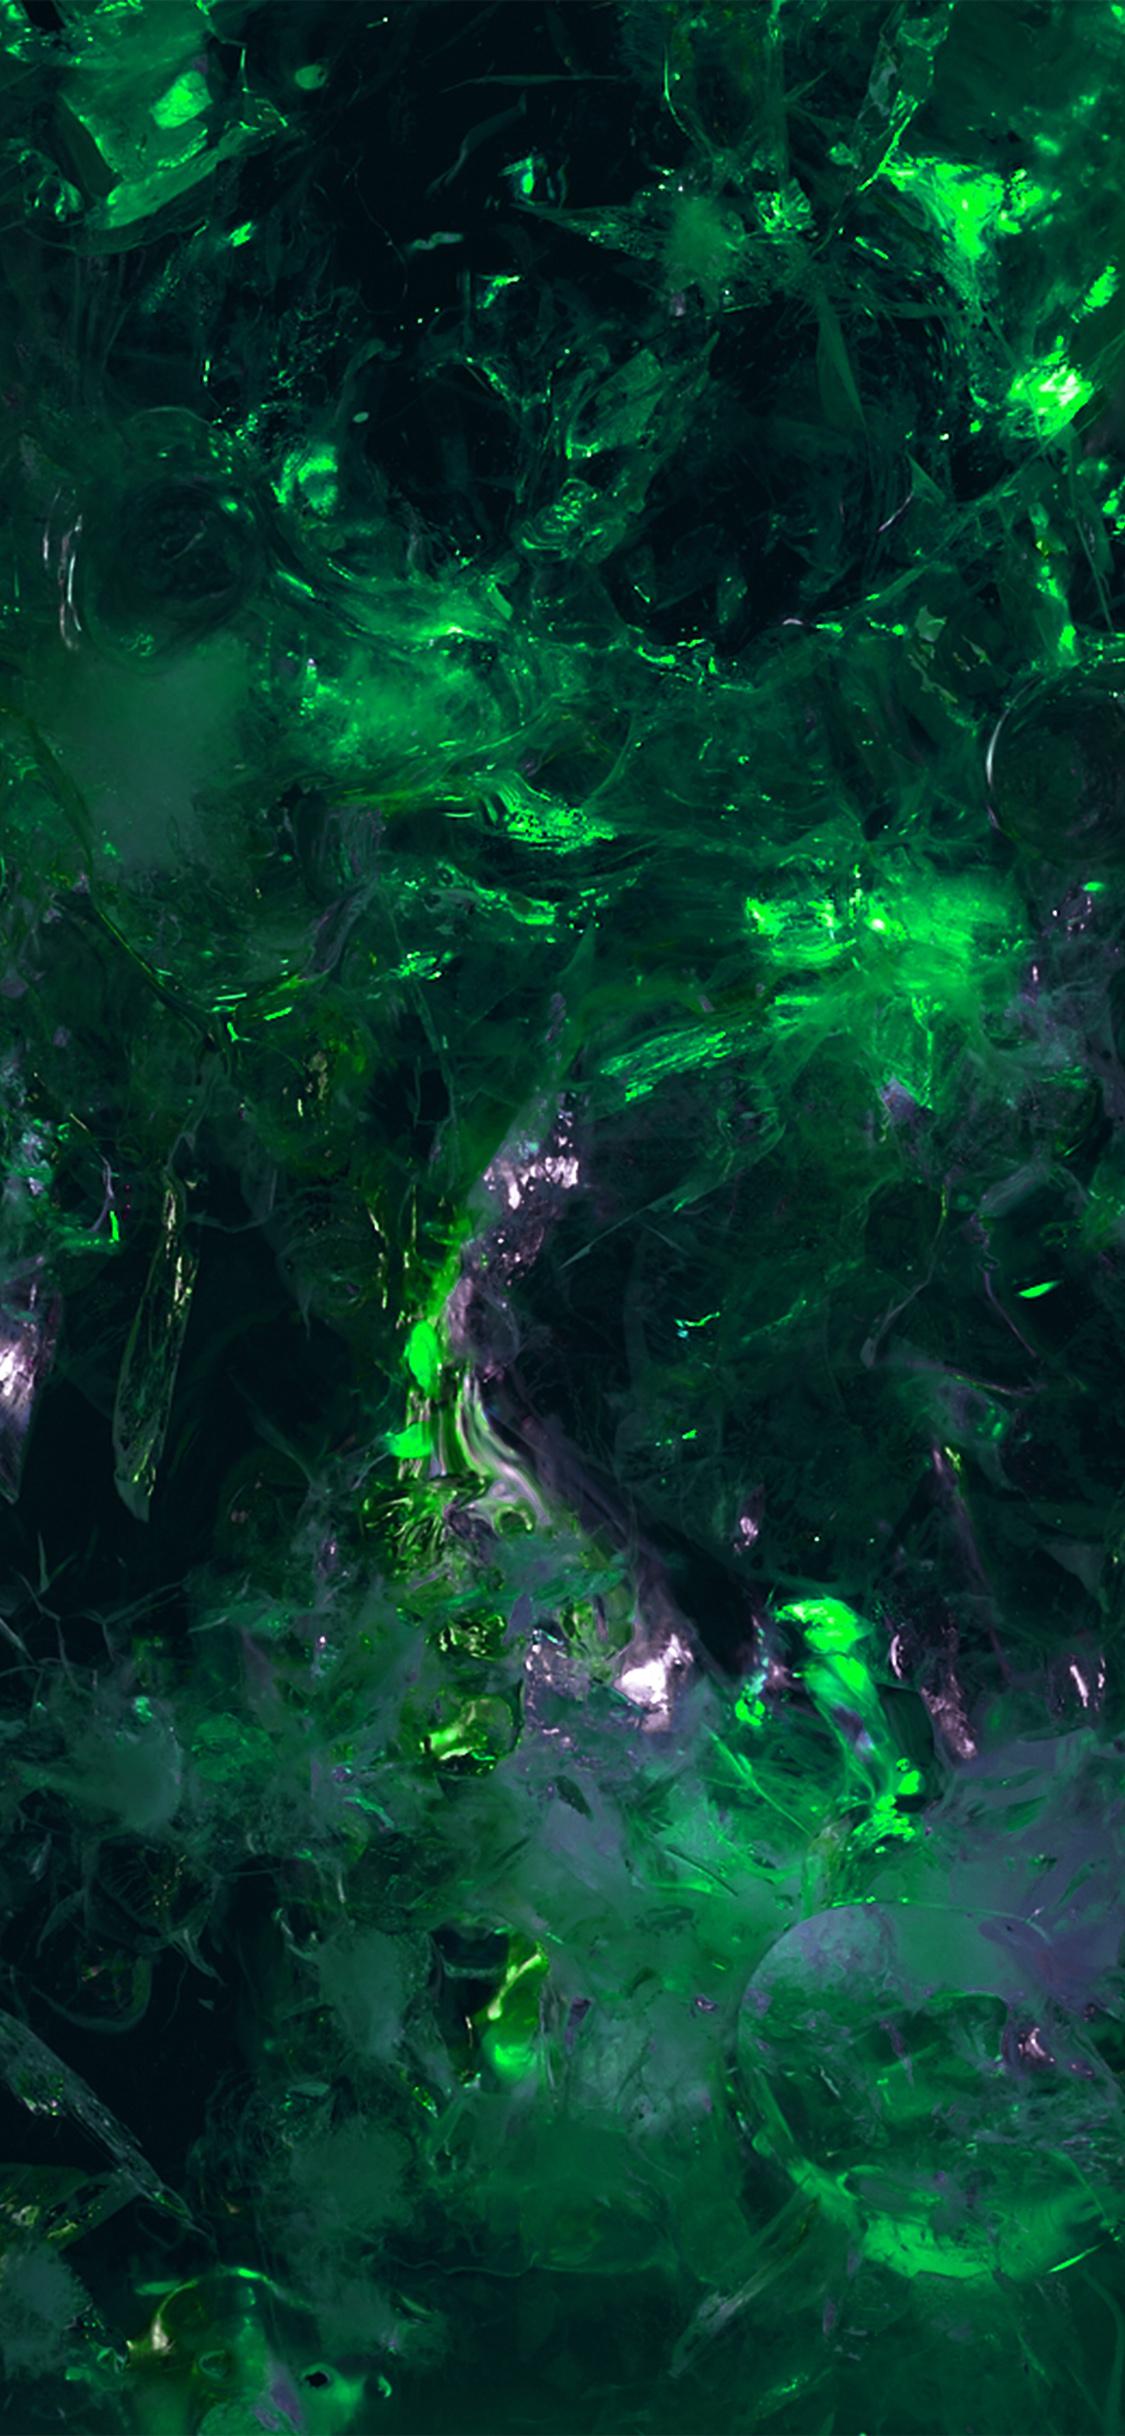 iPhonexpapers.com-Apple-iPhone-wallpaper-vx43-digital-wallpaper-grunge-pattern-background-green